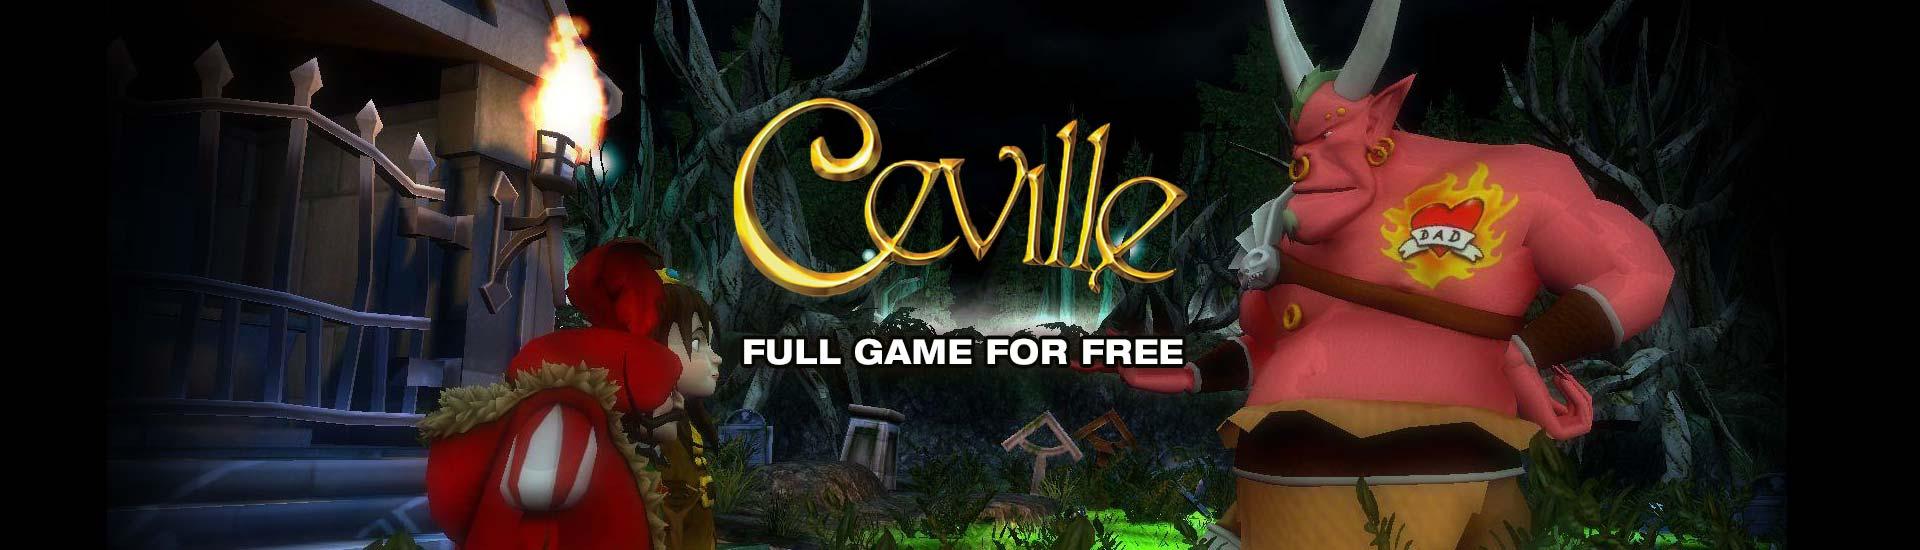 Ceville cover